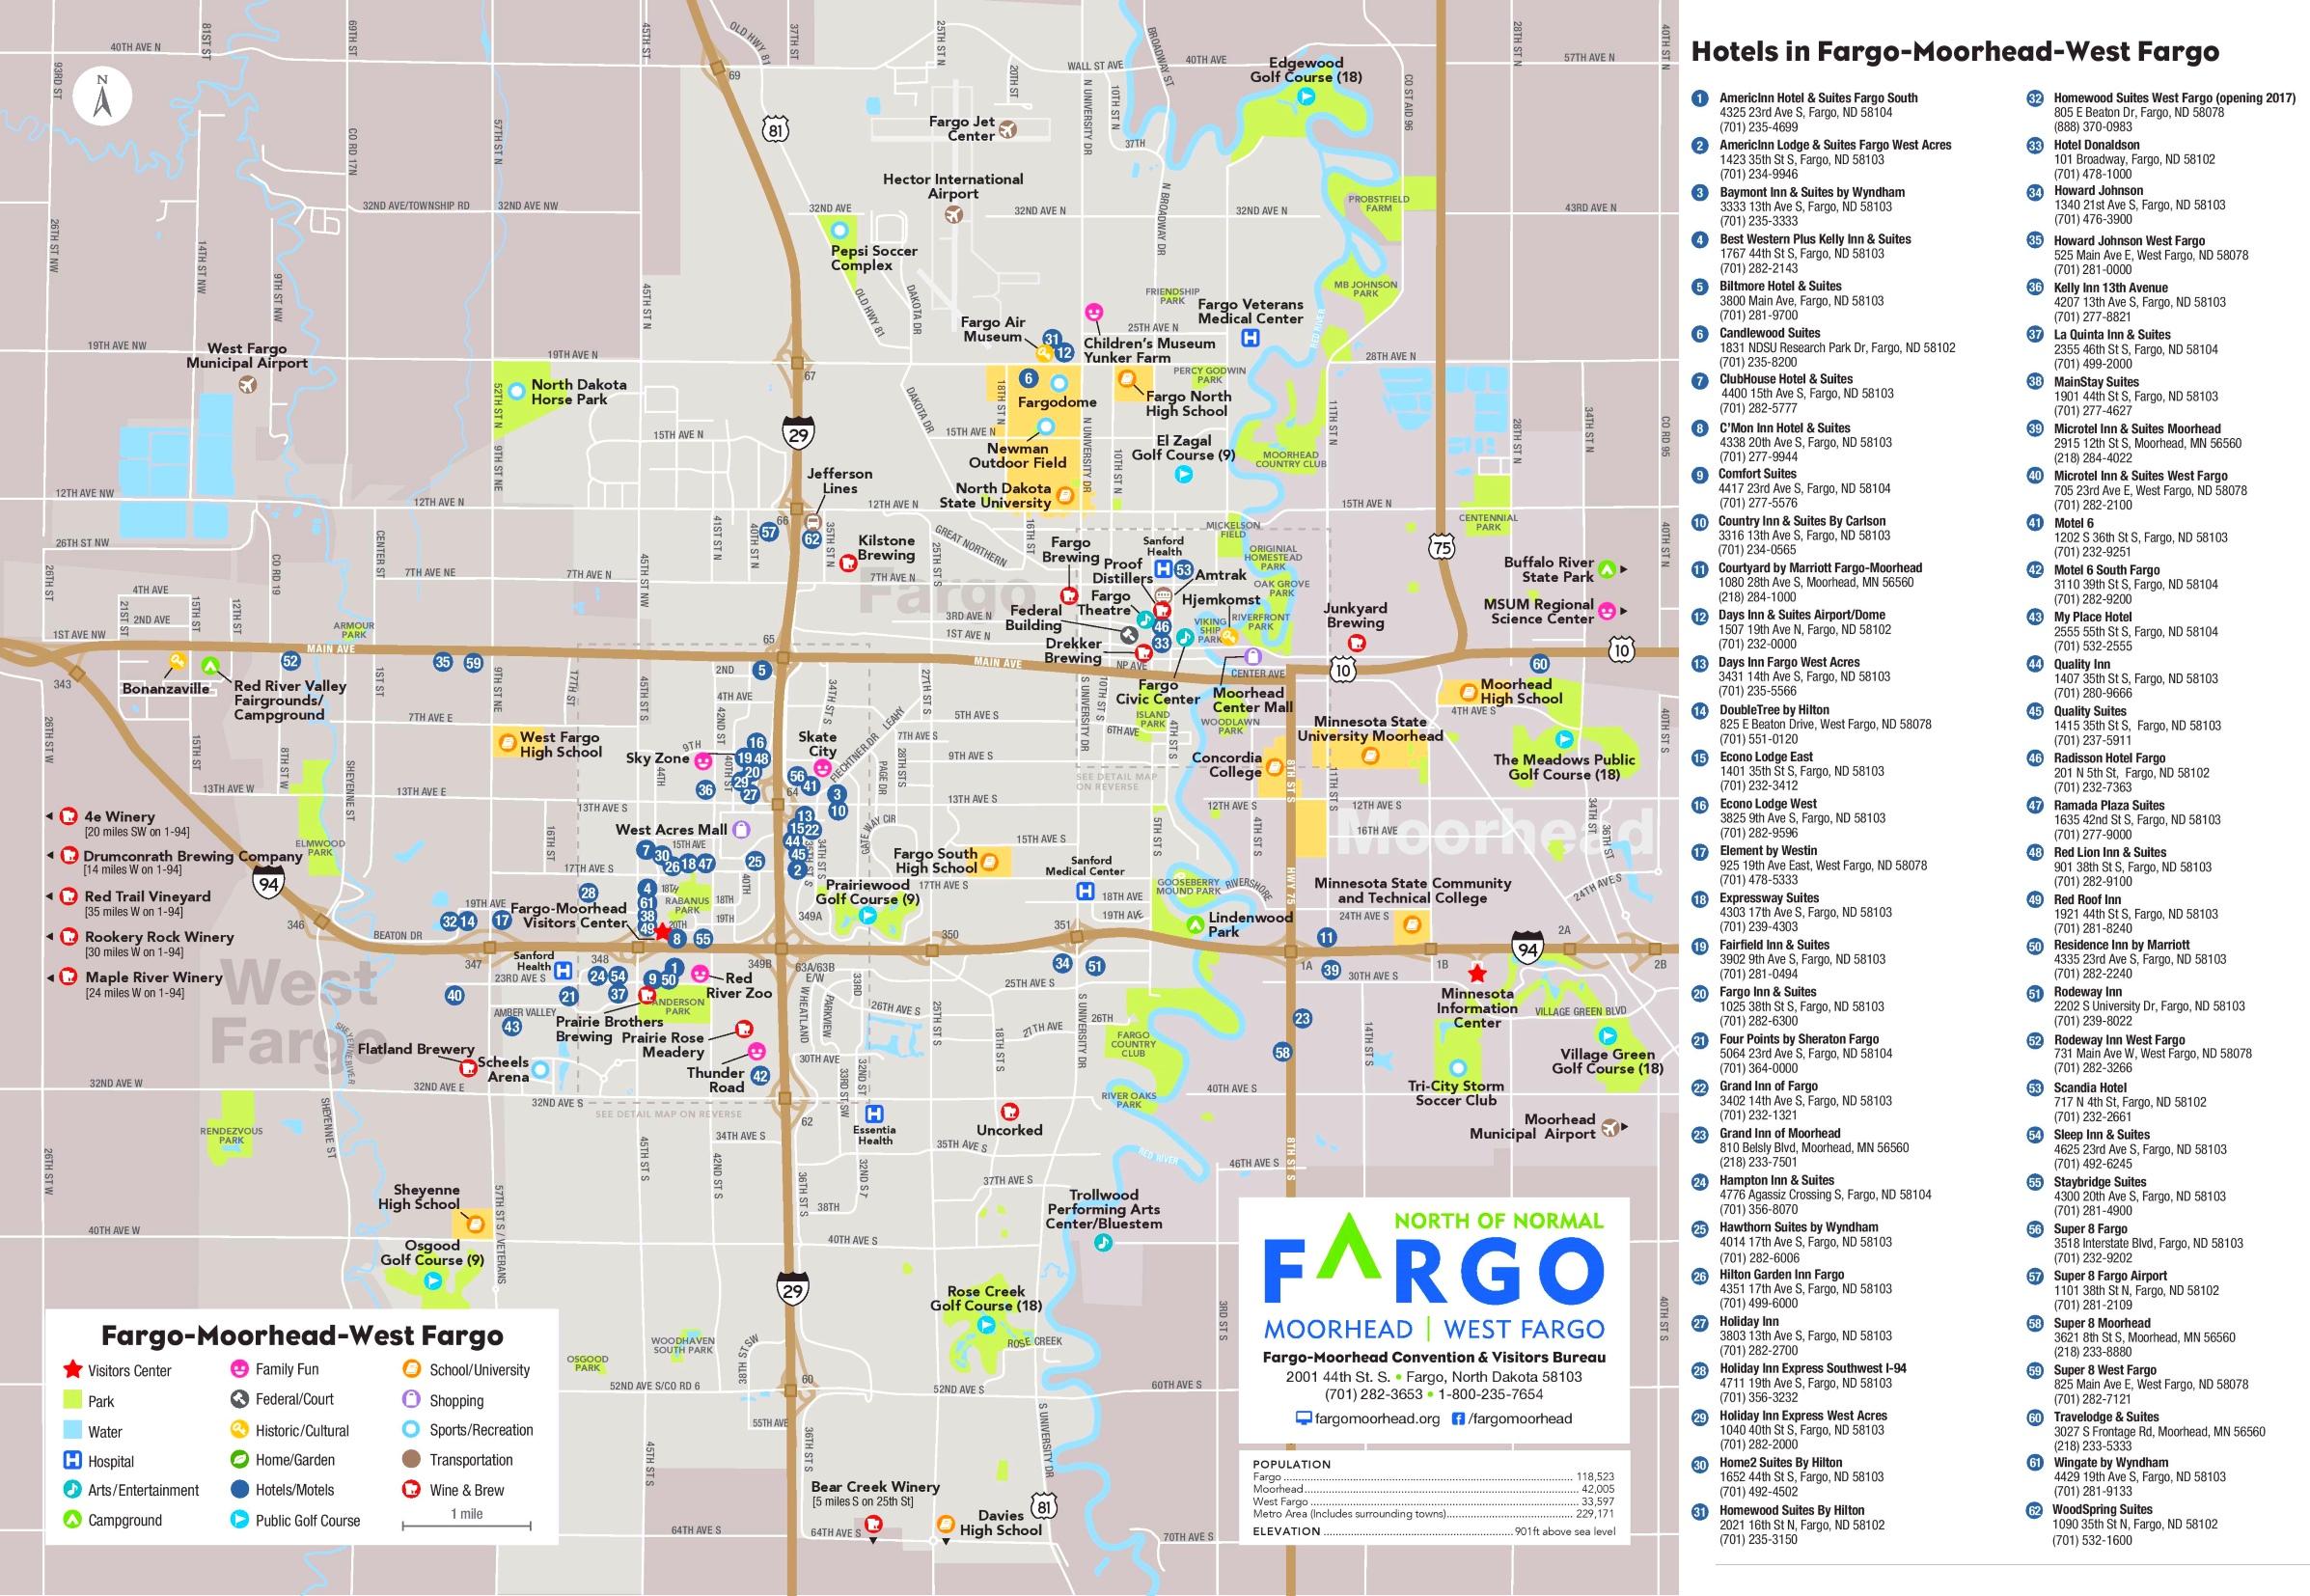 Fargo and Moorhead hotel map